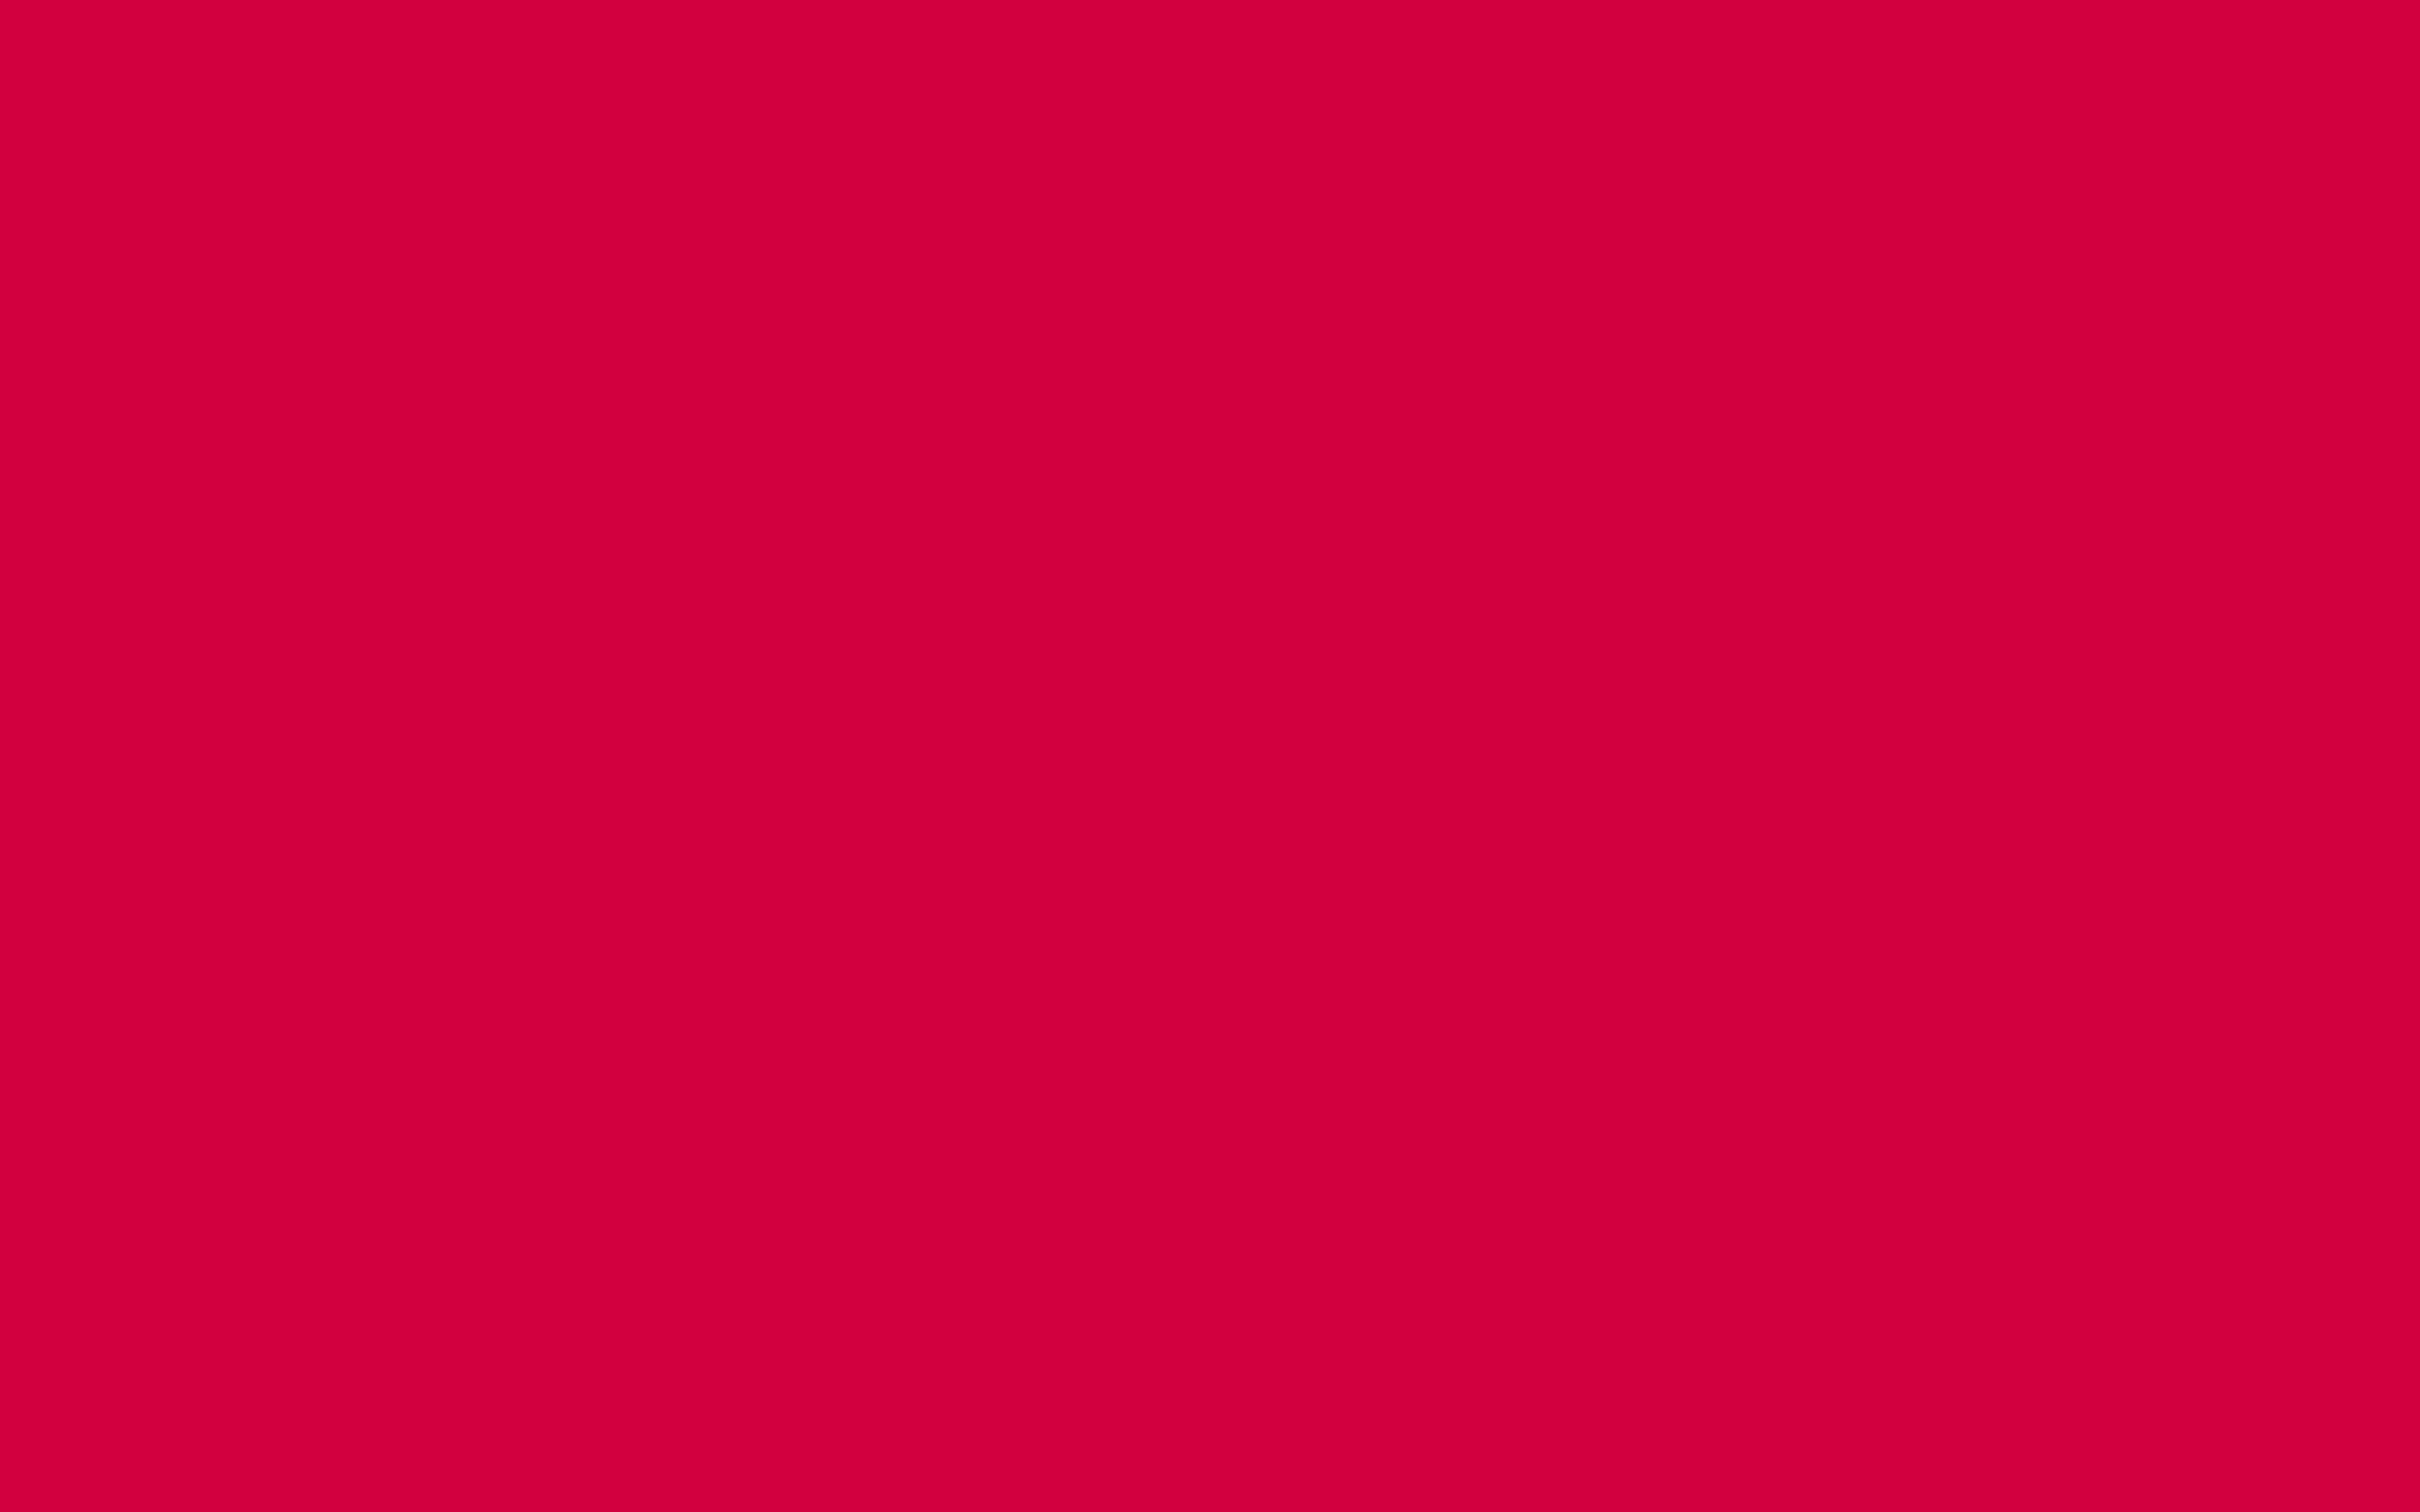 2560x1600 Utah Crimson Solid Color Background